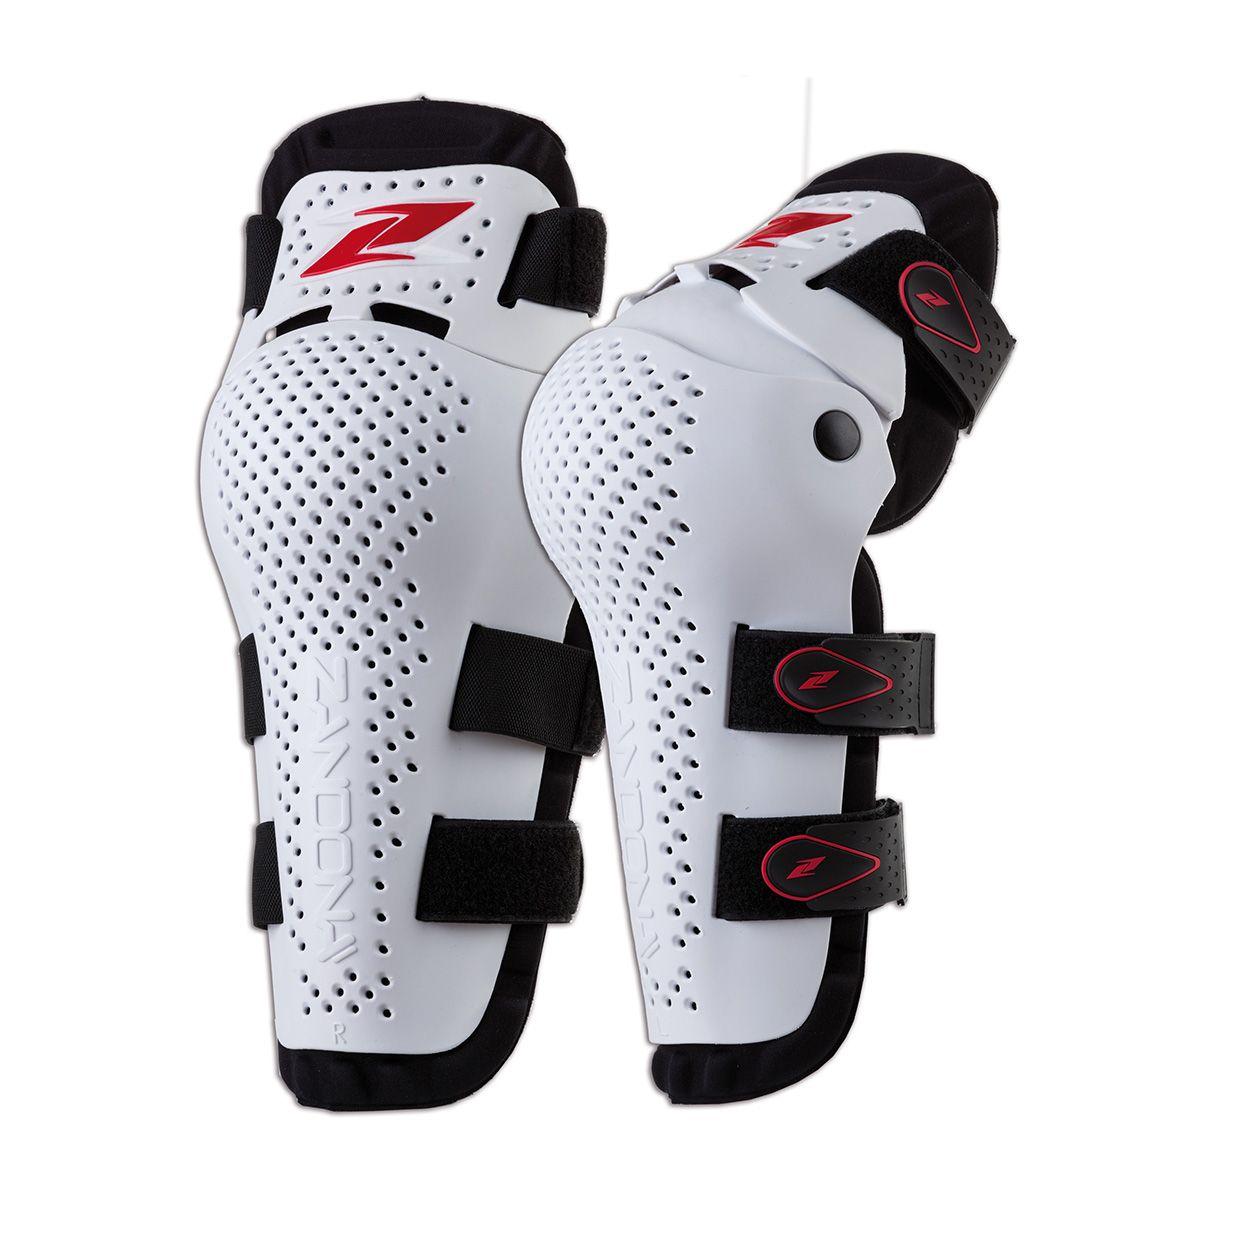 Zandona 3260 Kneeprotector de Luxe White